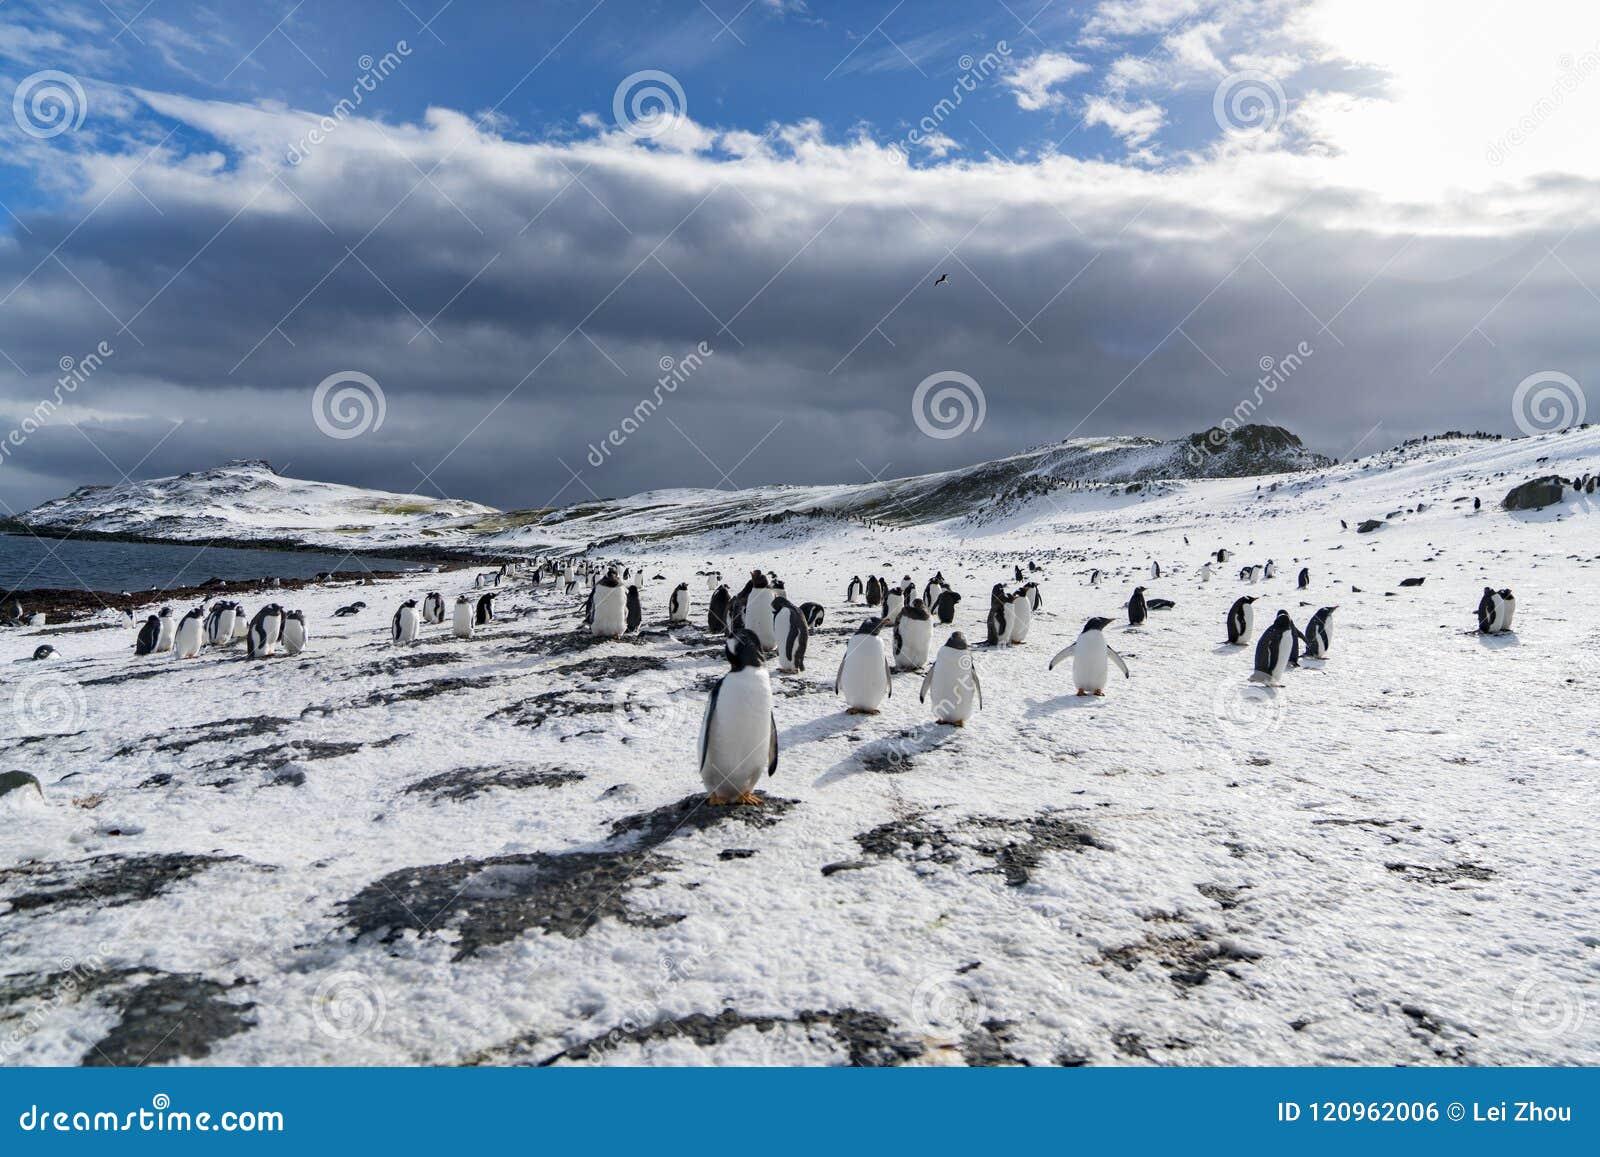 The Penguin Family in the sun.Antarctica